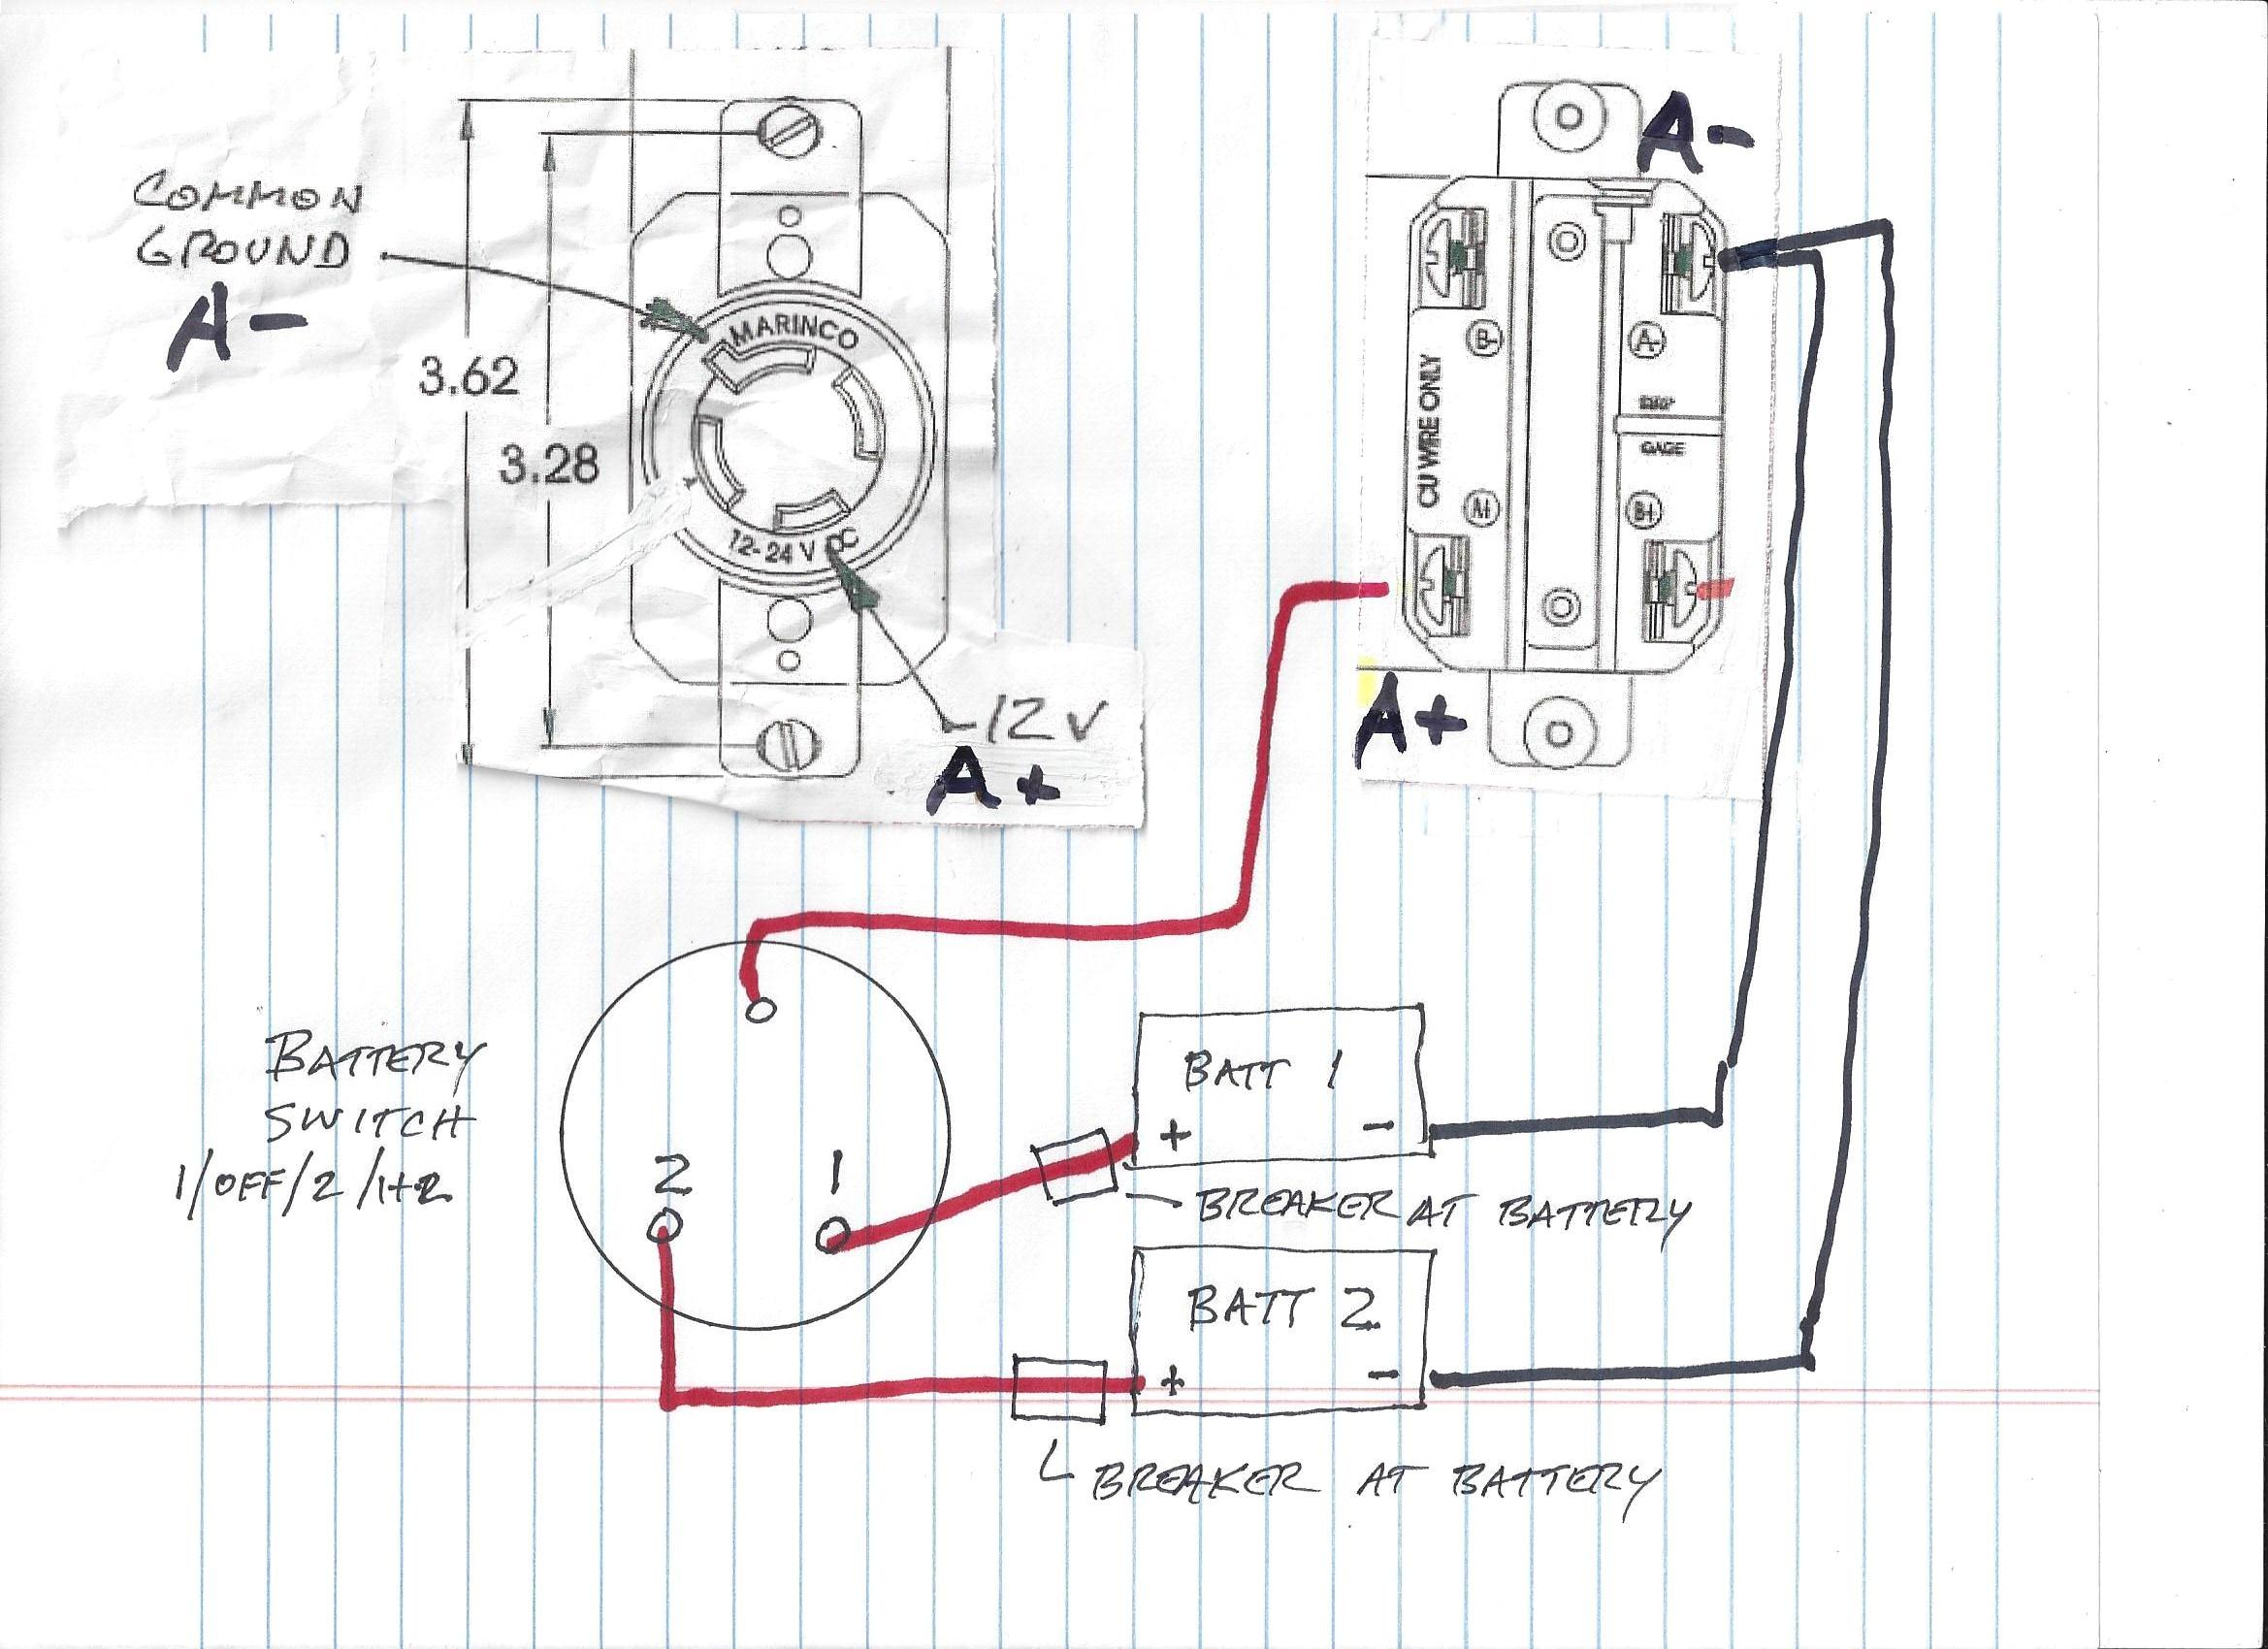 12 Volt Trolling Motor Wiring Diagram | Wiring Diagram - 12V Trolling Motor Wiring Diagram